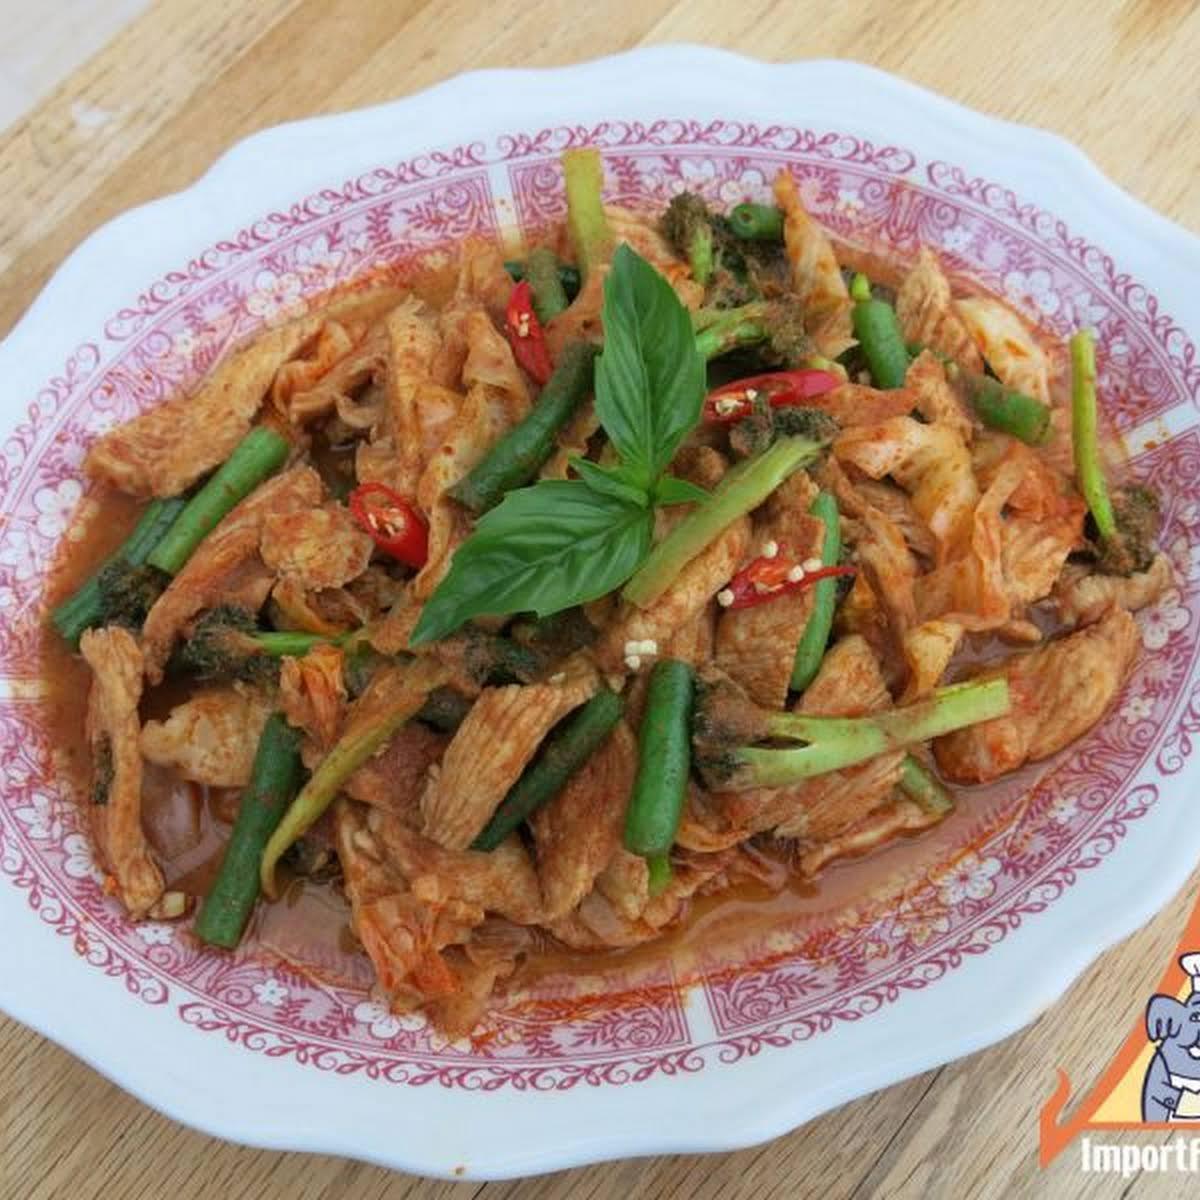 Thai Chicken and Veggies, Gai Pad Prik